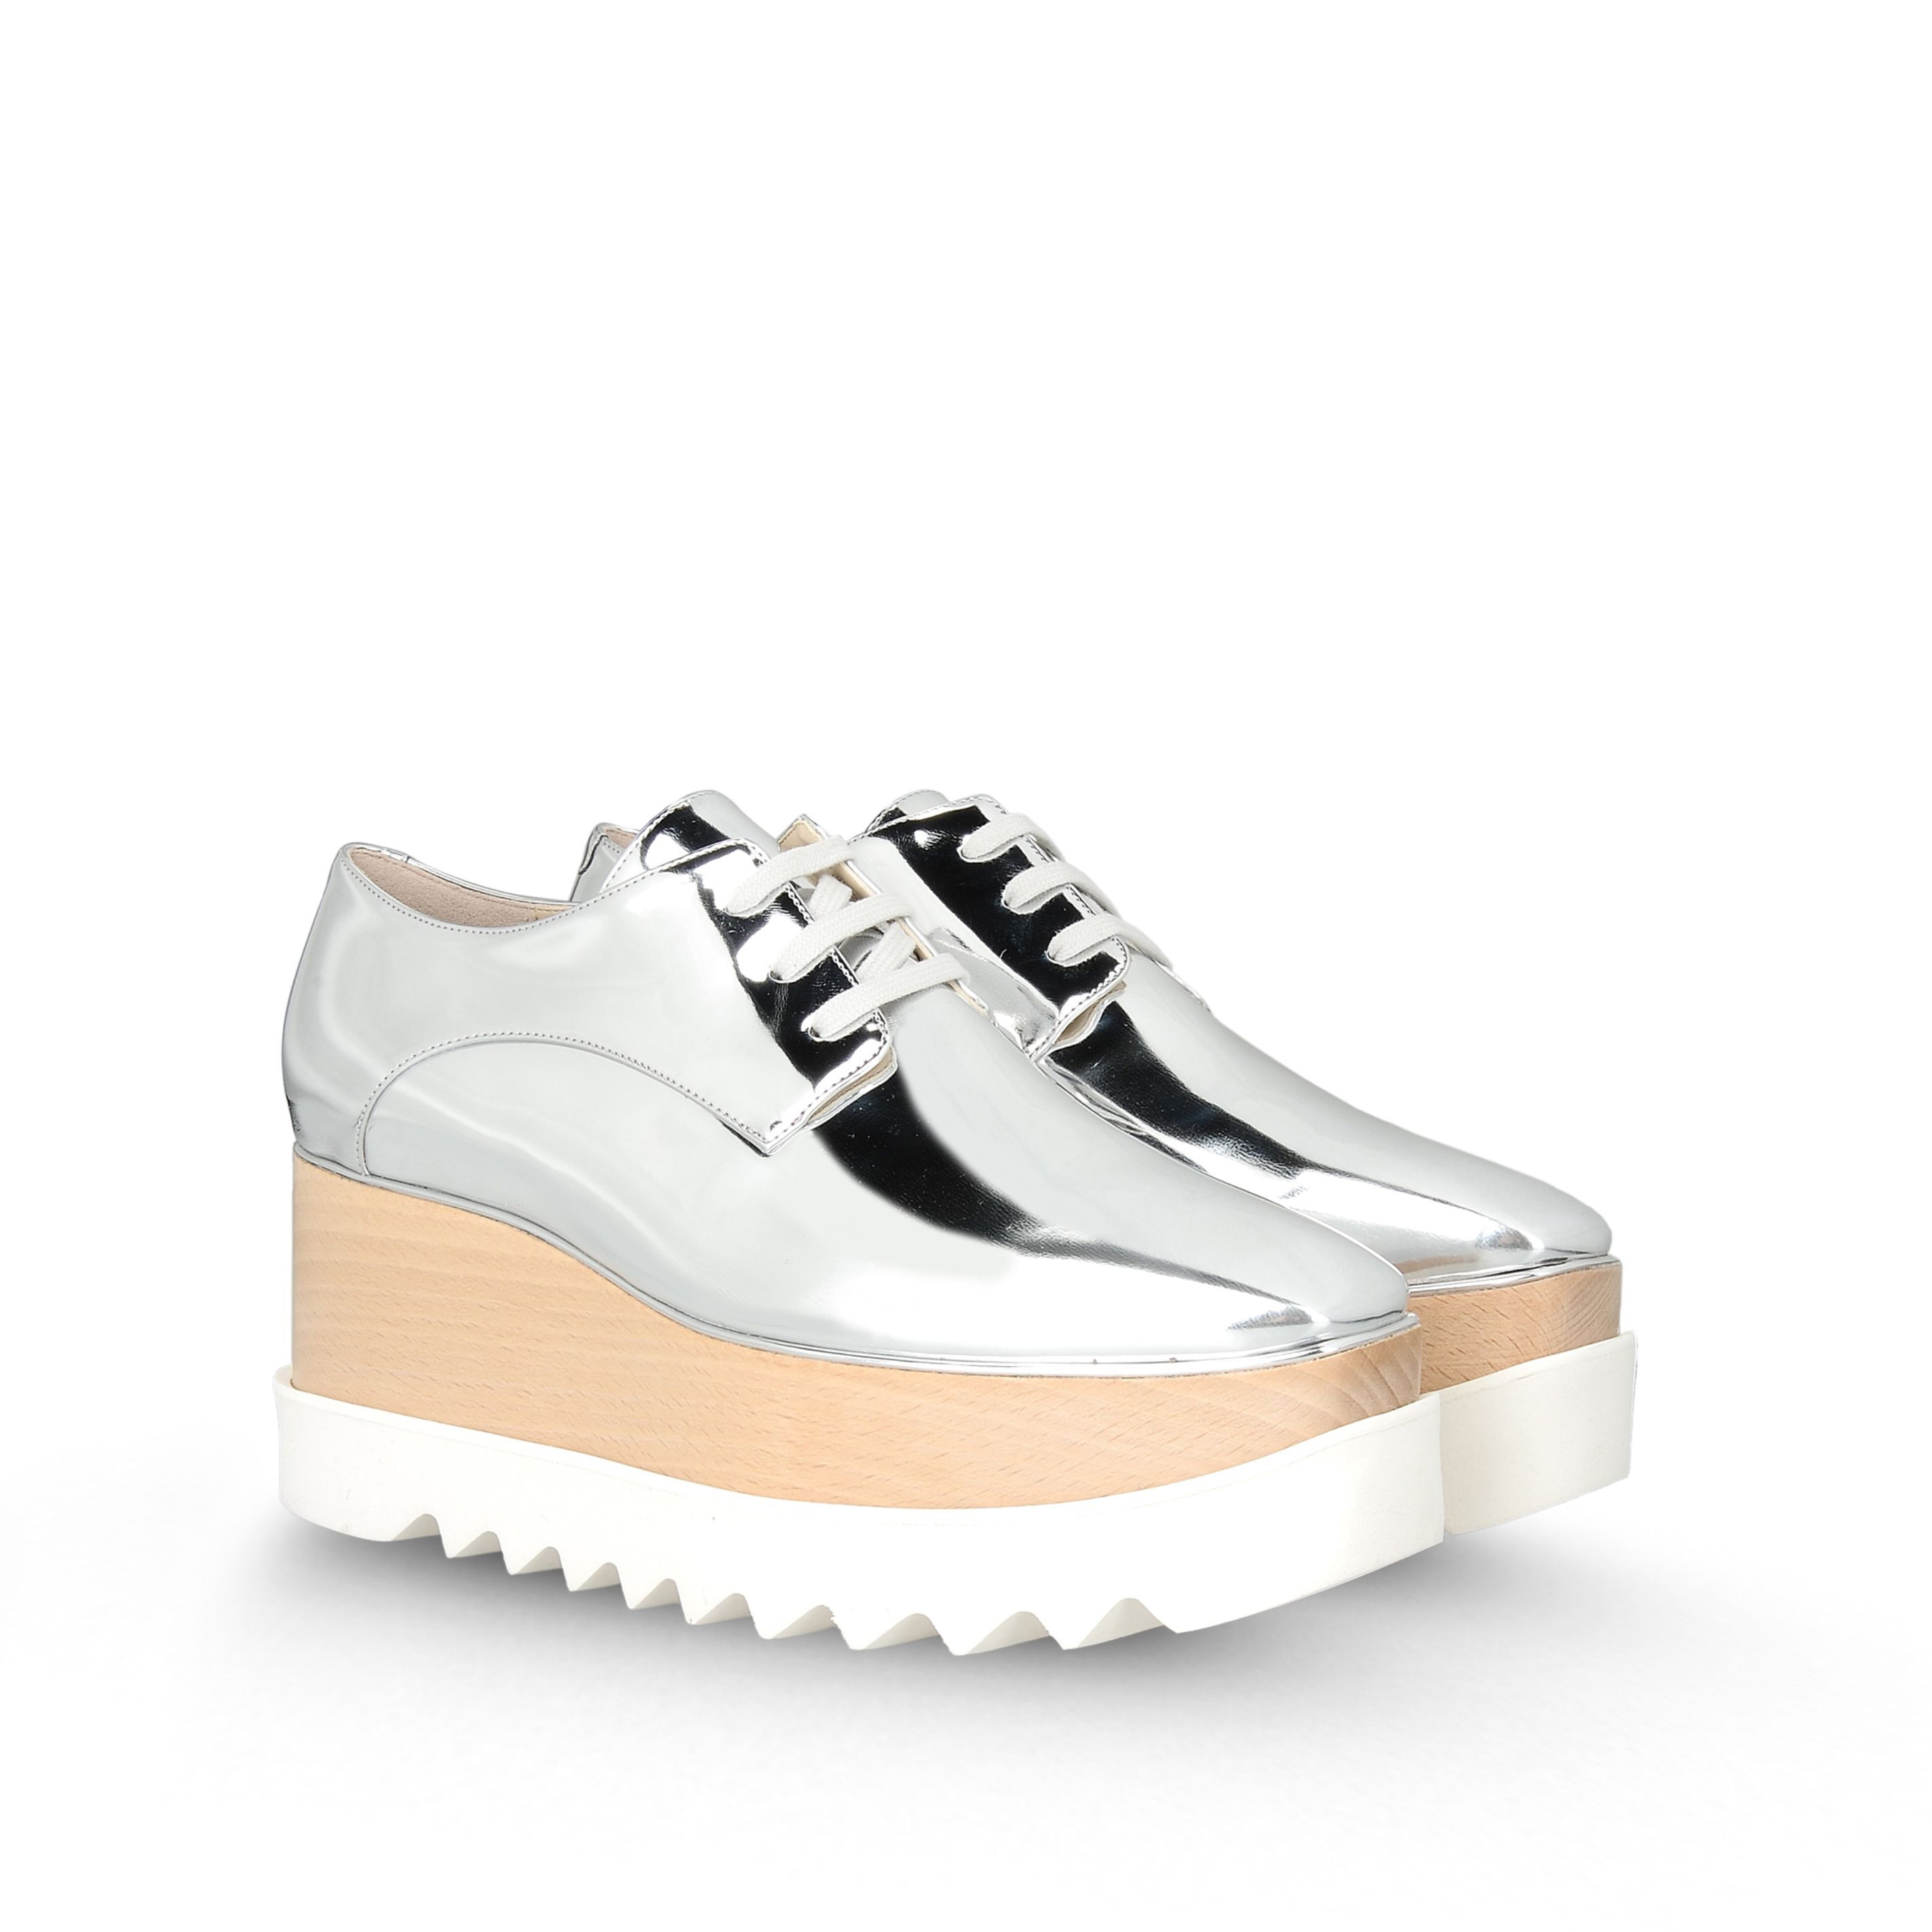 Silver Elyse Shoes - Stella Mccartney